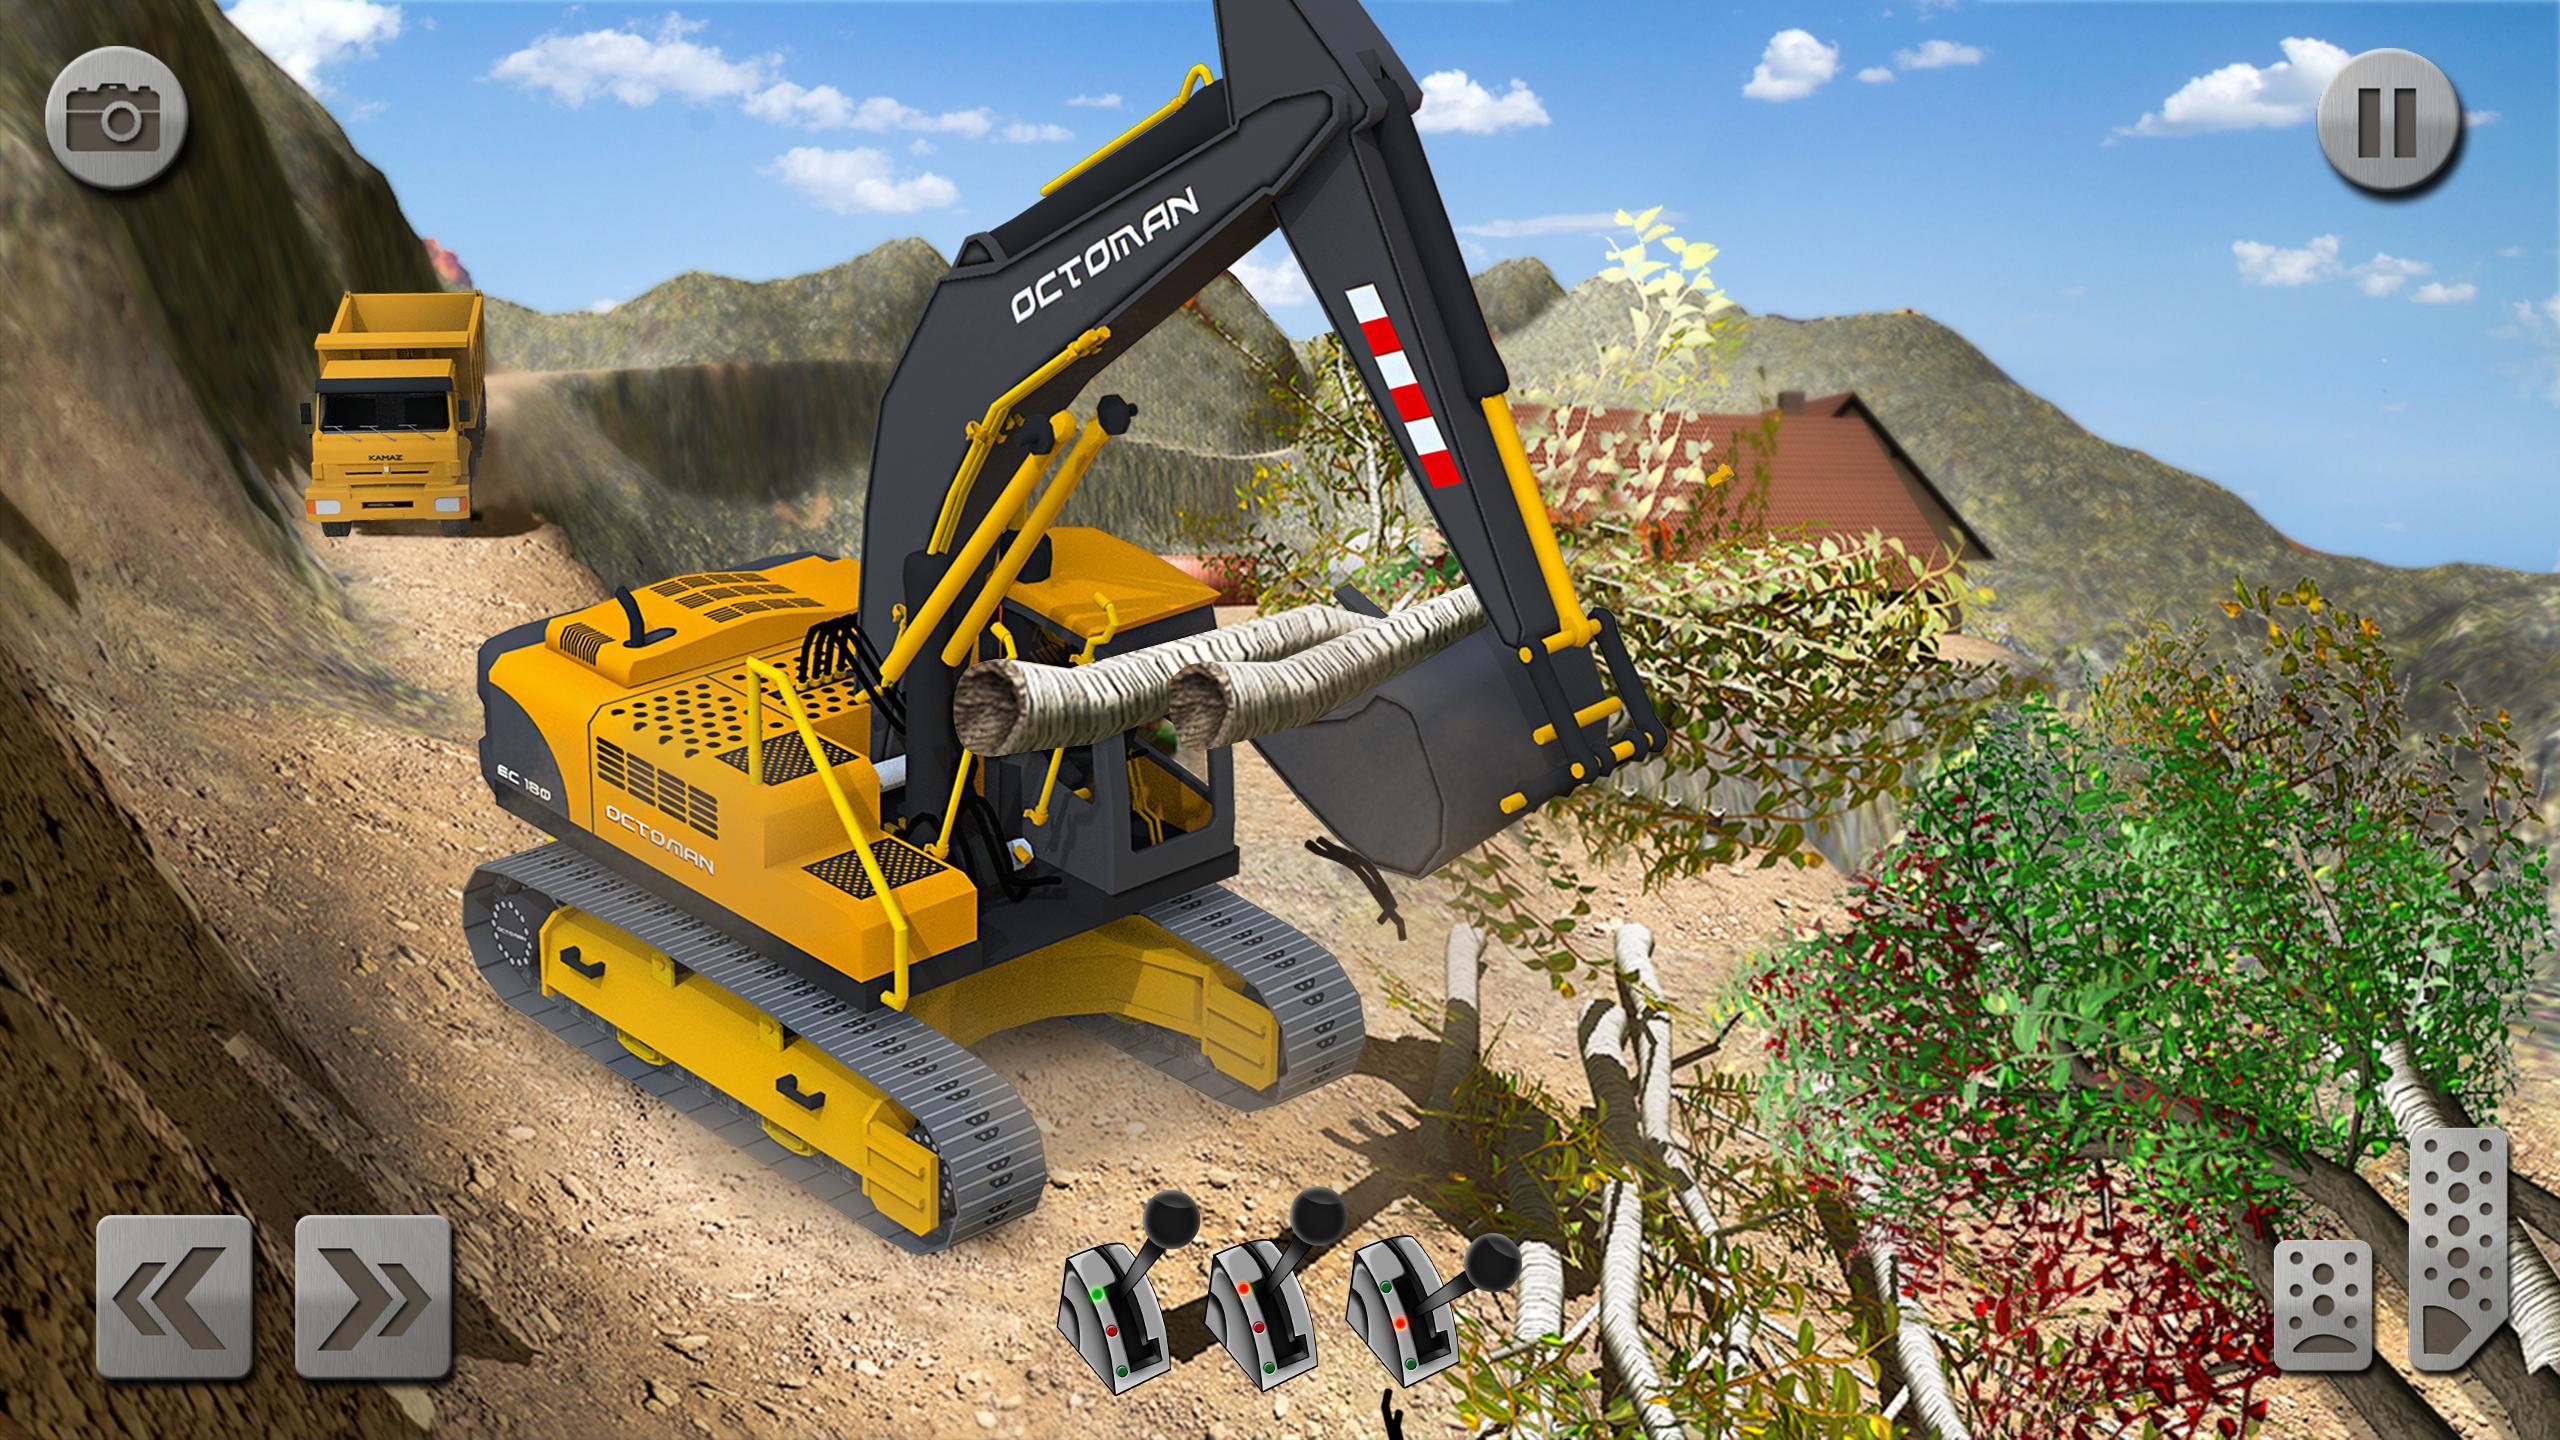 Sand Excavator Truck Driving Rescue Simulator game 5.2 Screenshot 14